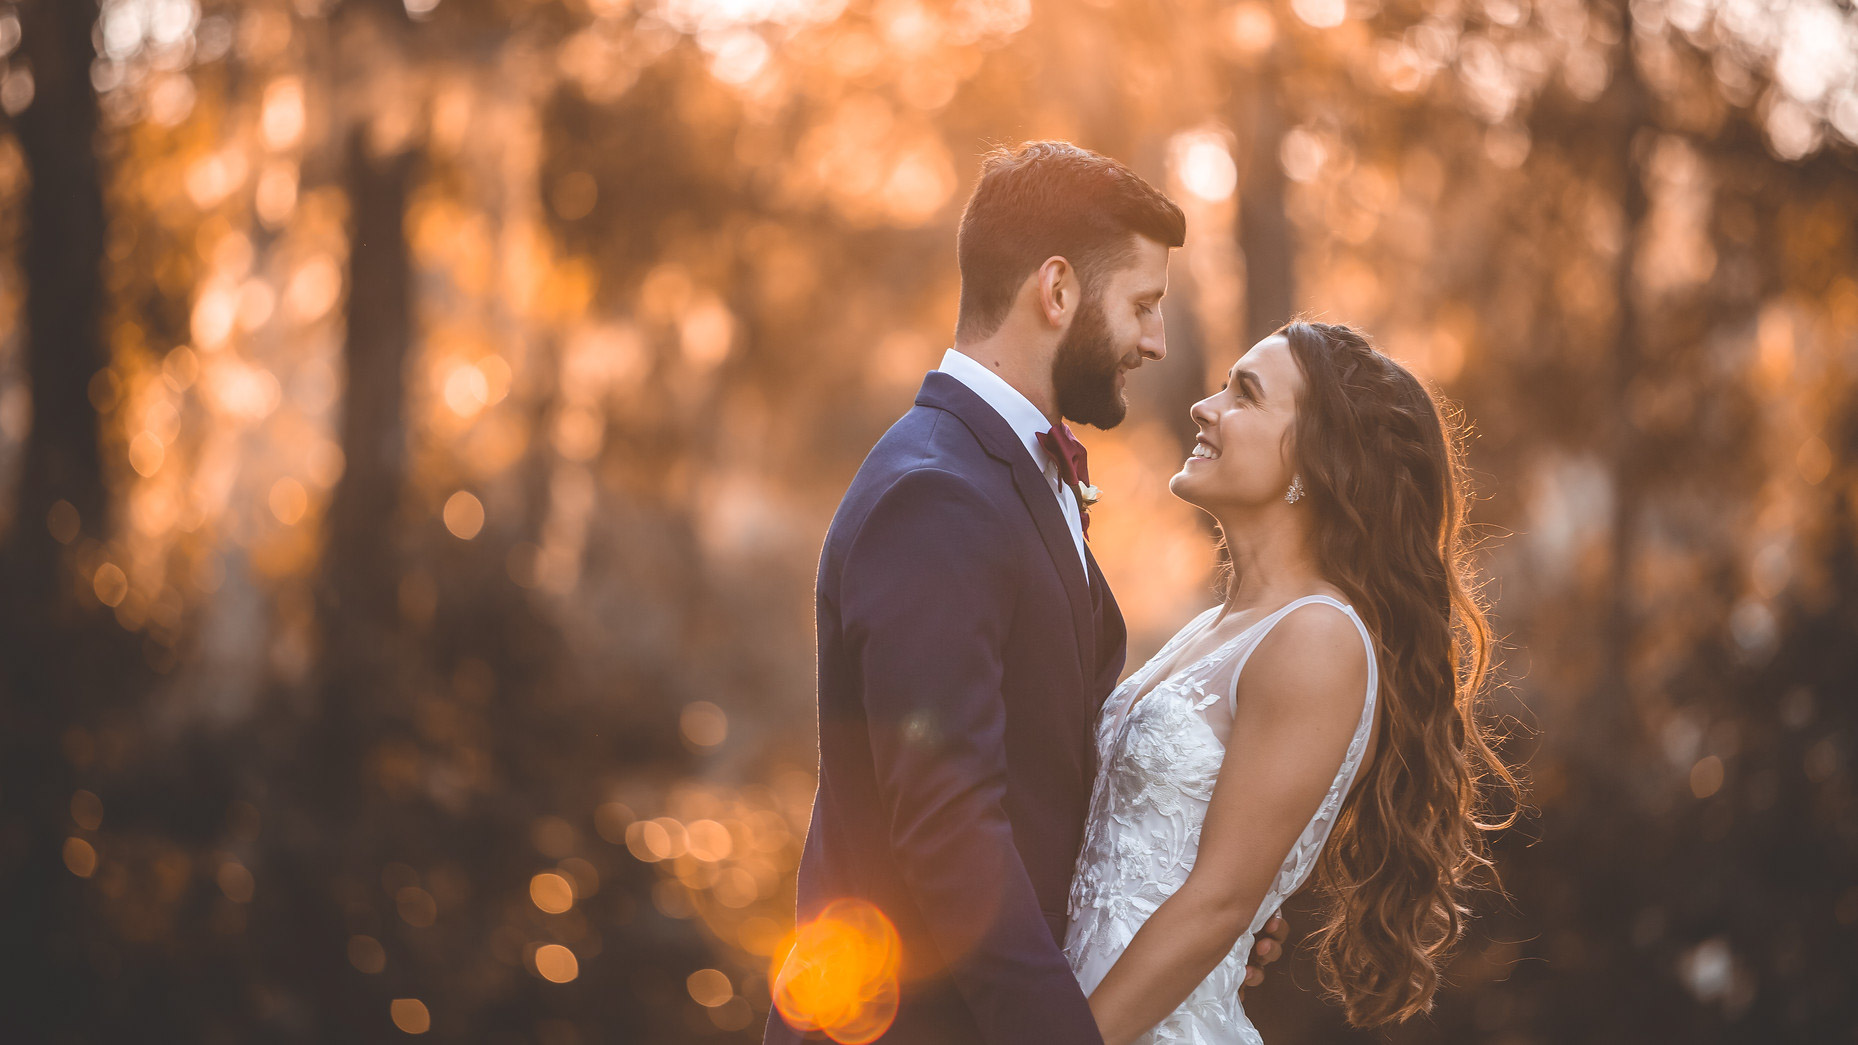 adam-szarmack-bowing-oaks-wedding-photographer-jacksonville-111.jpg